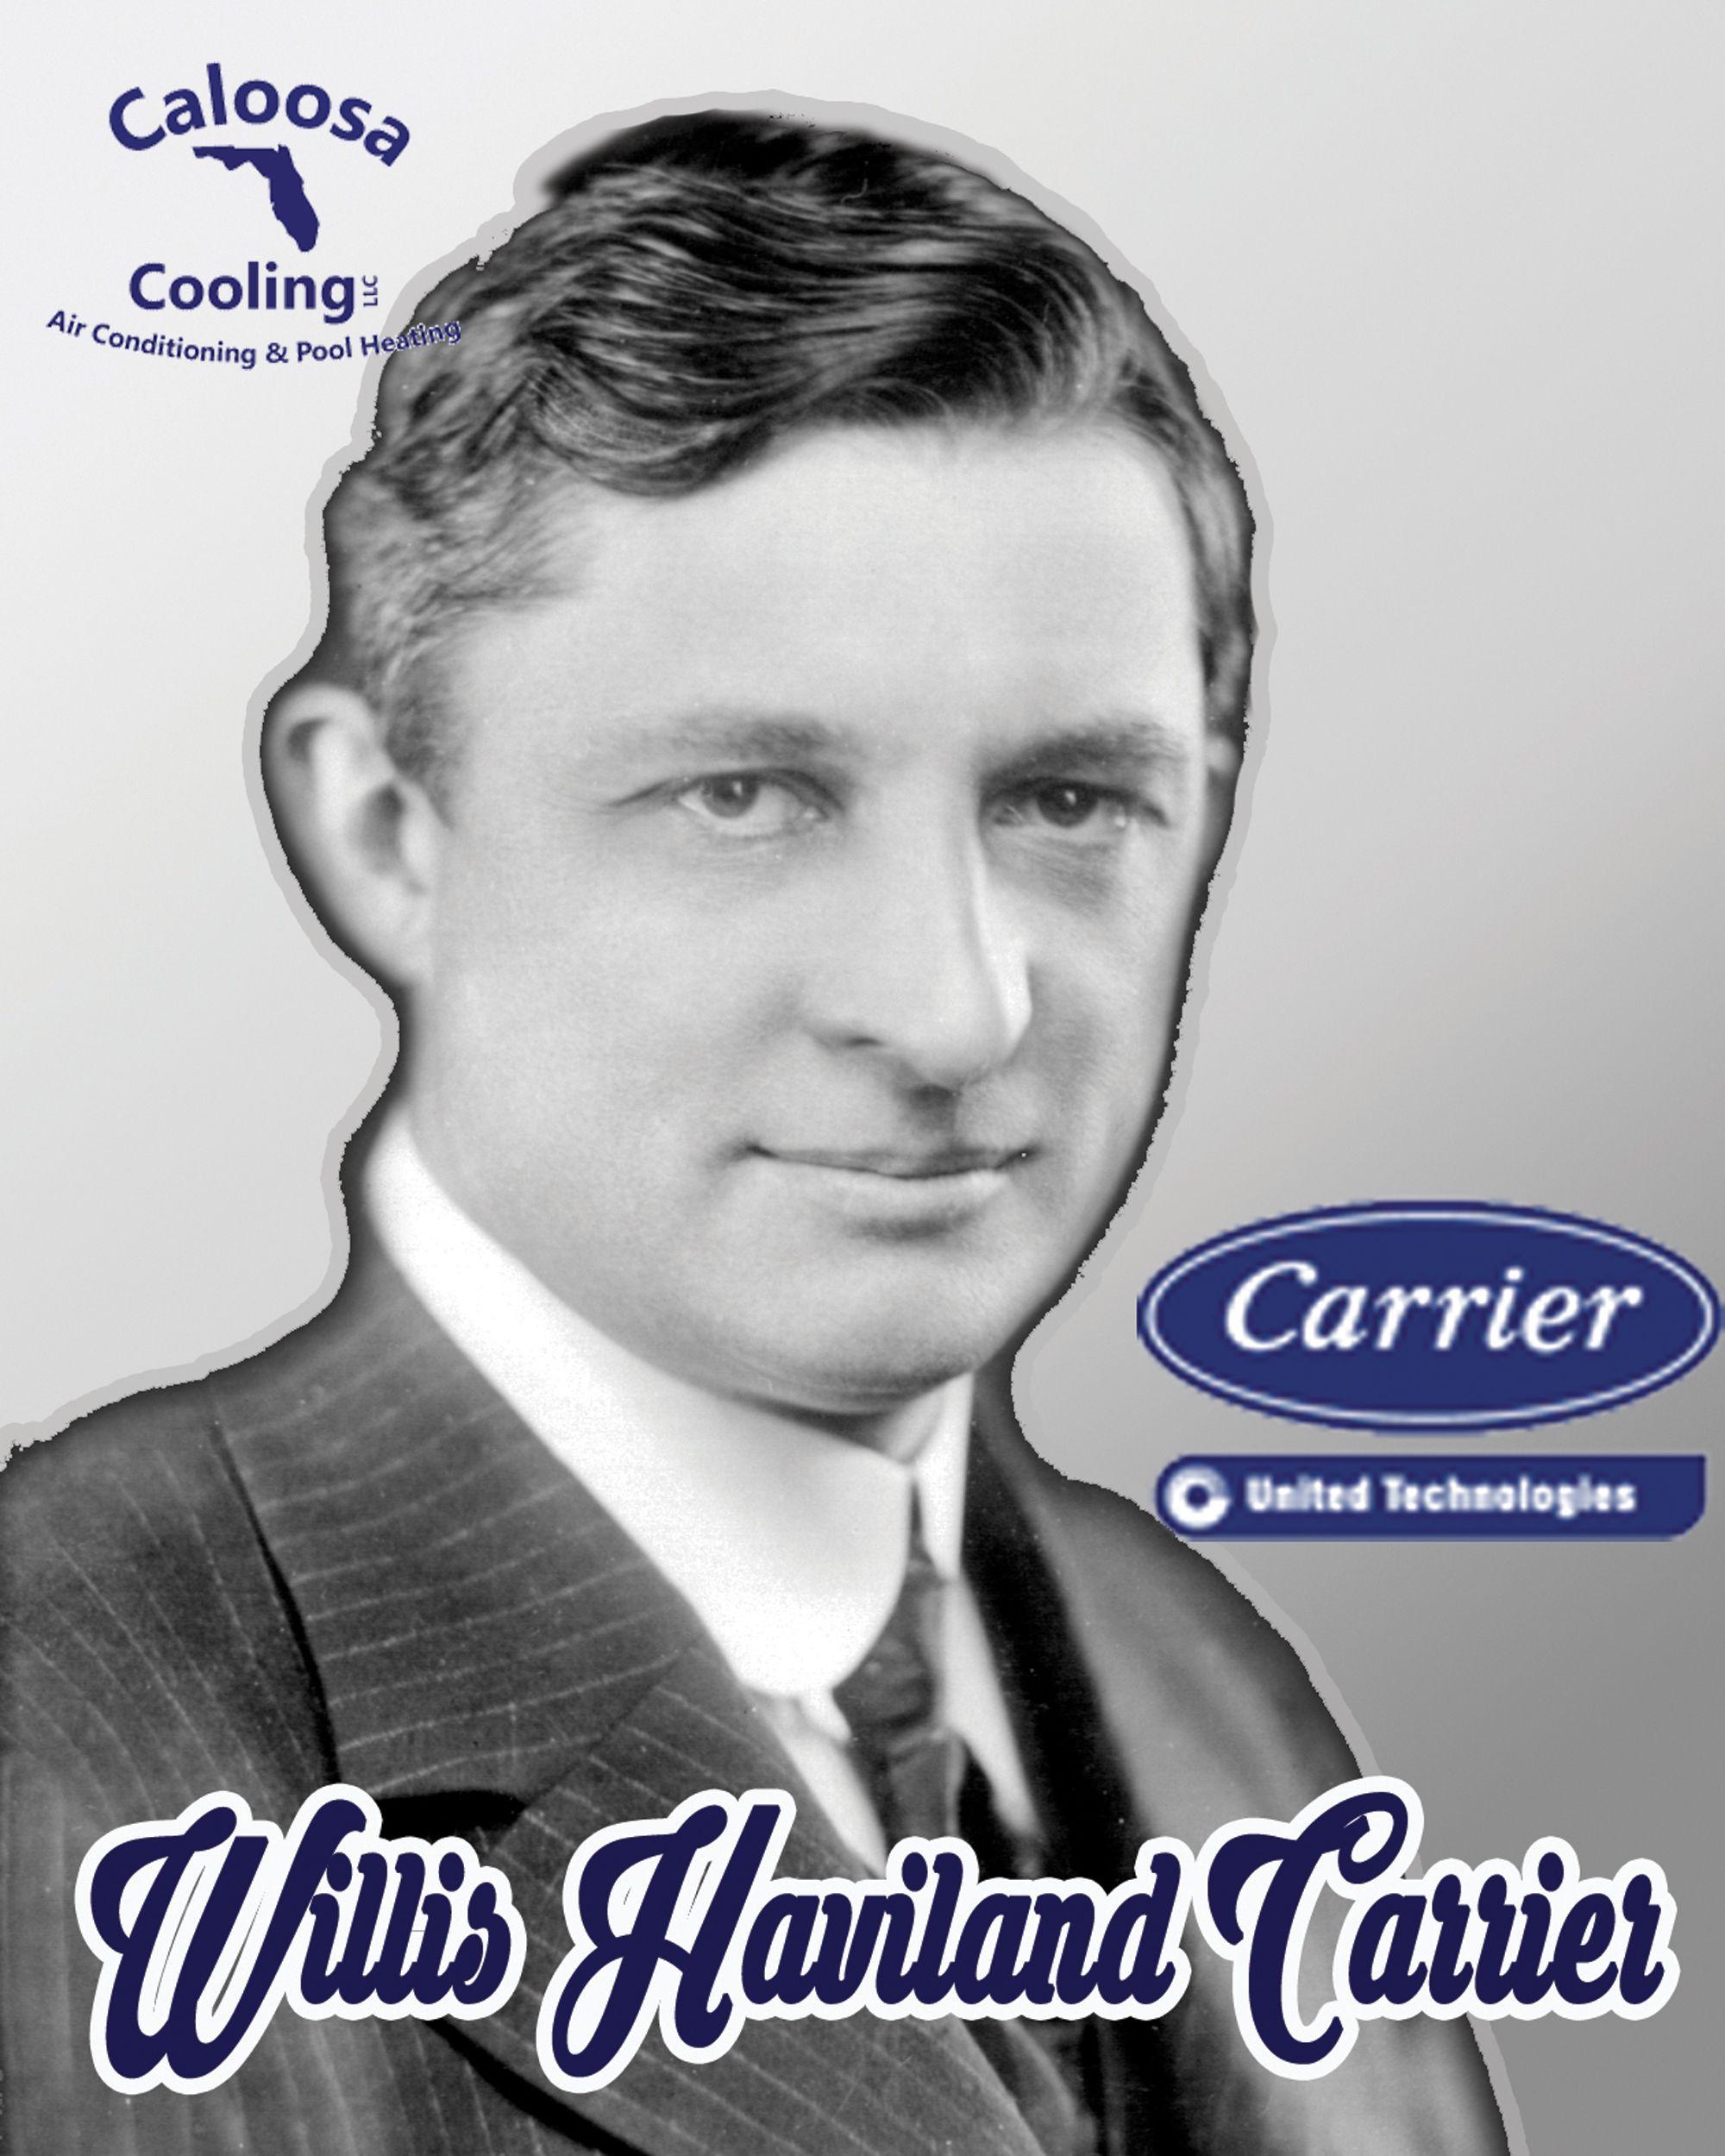 Willis Havilland Carrier, an American engineer who